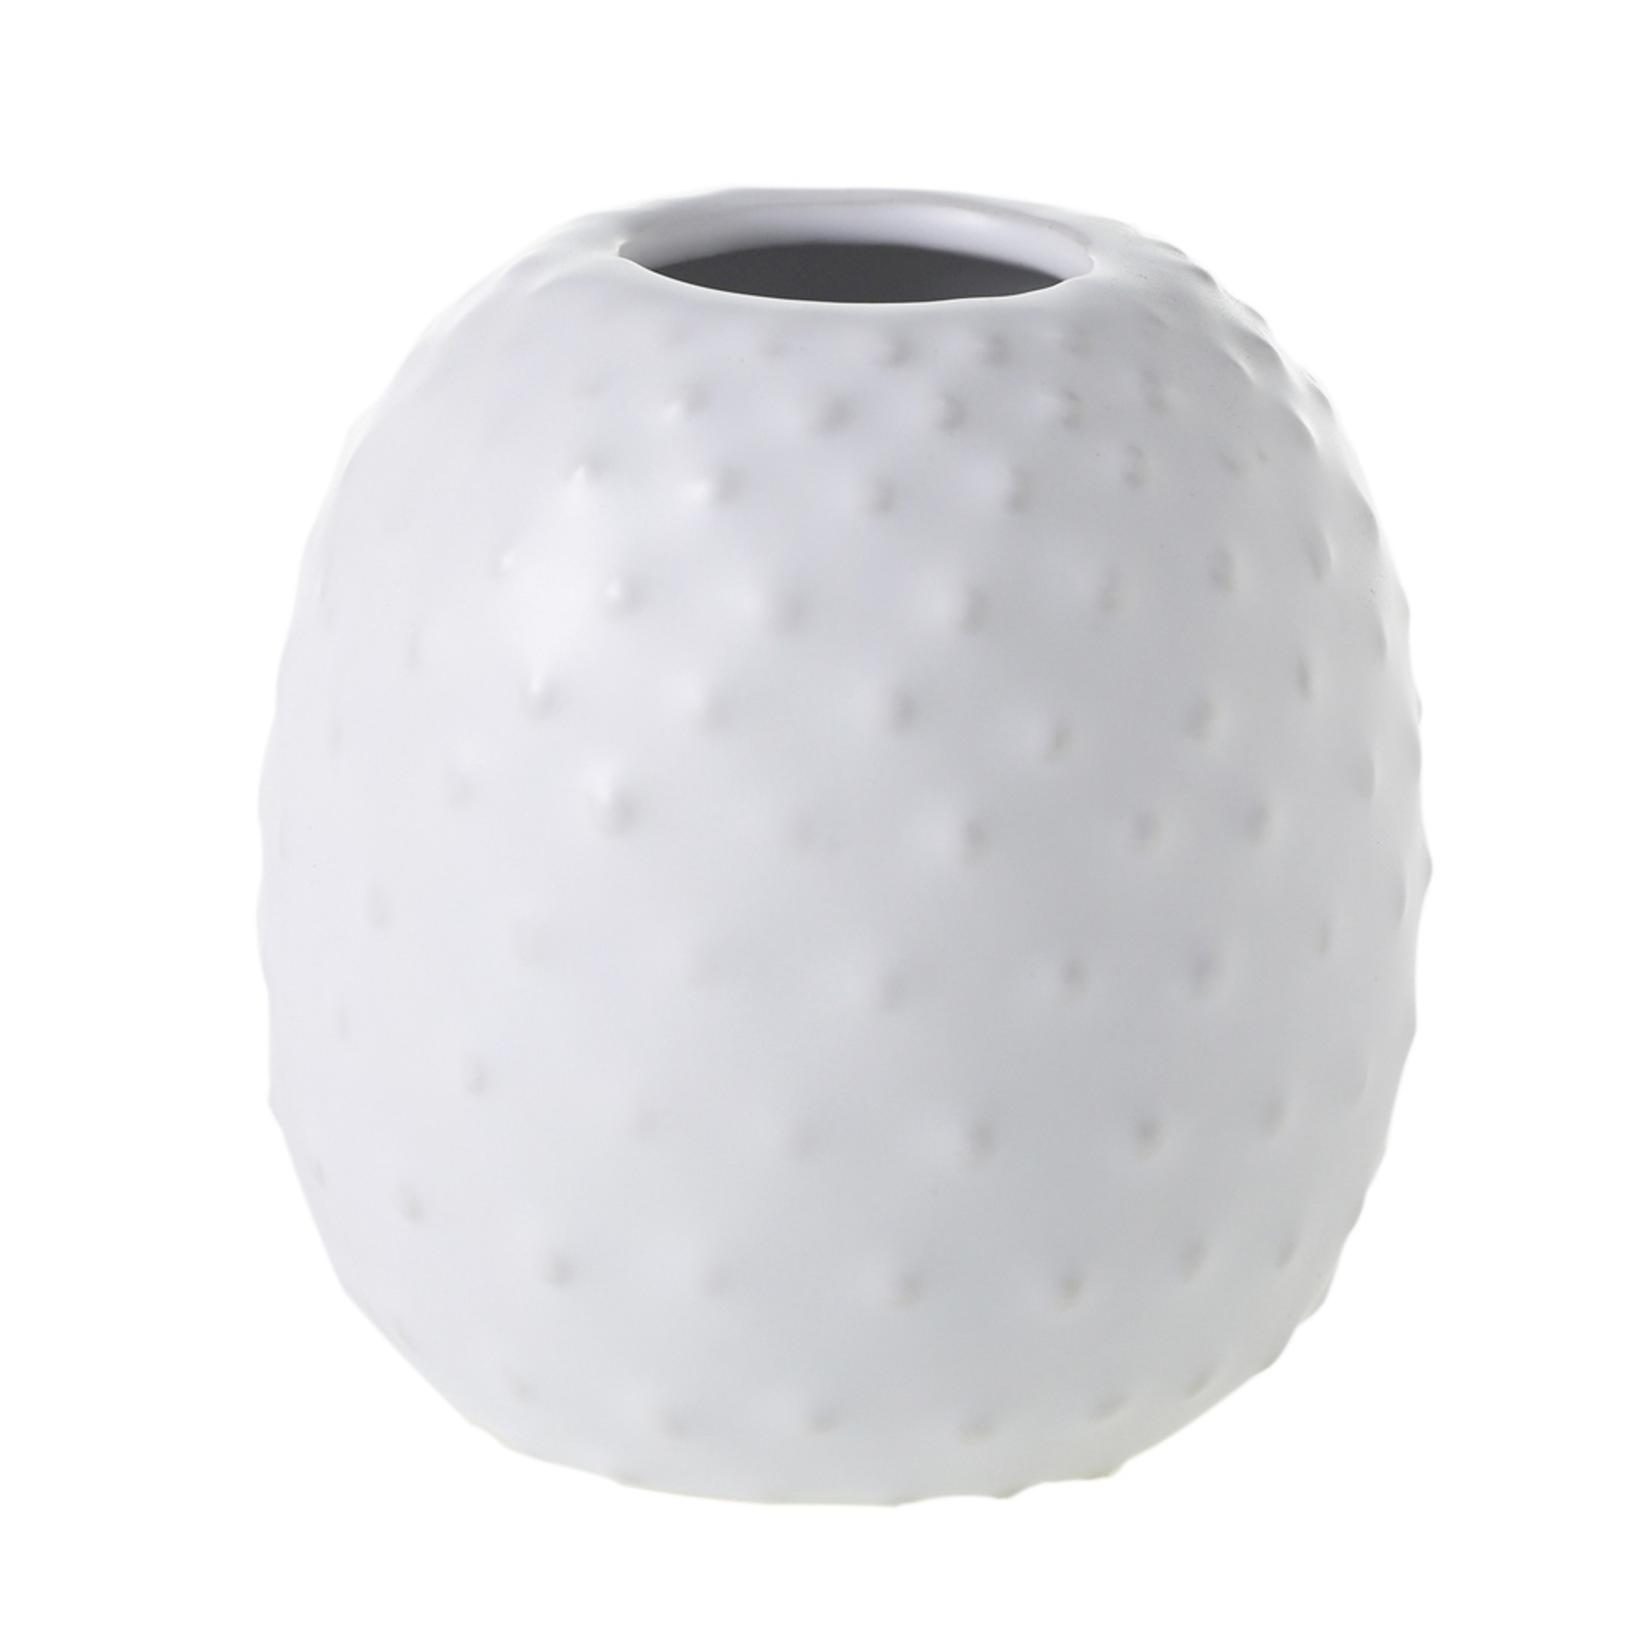 "4.25""x 4.5"" Prickly Vase (AD)"